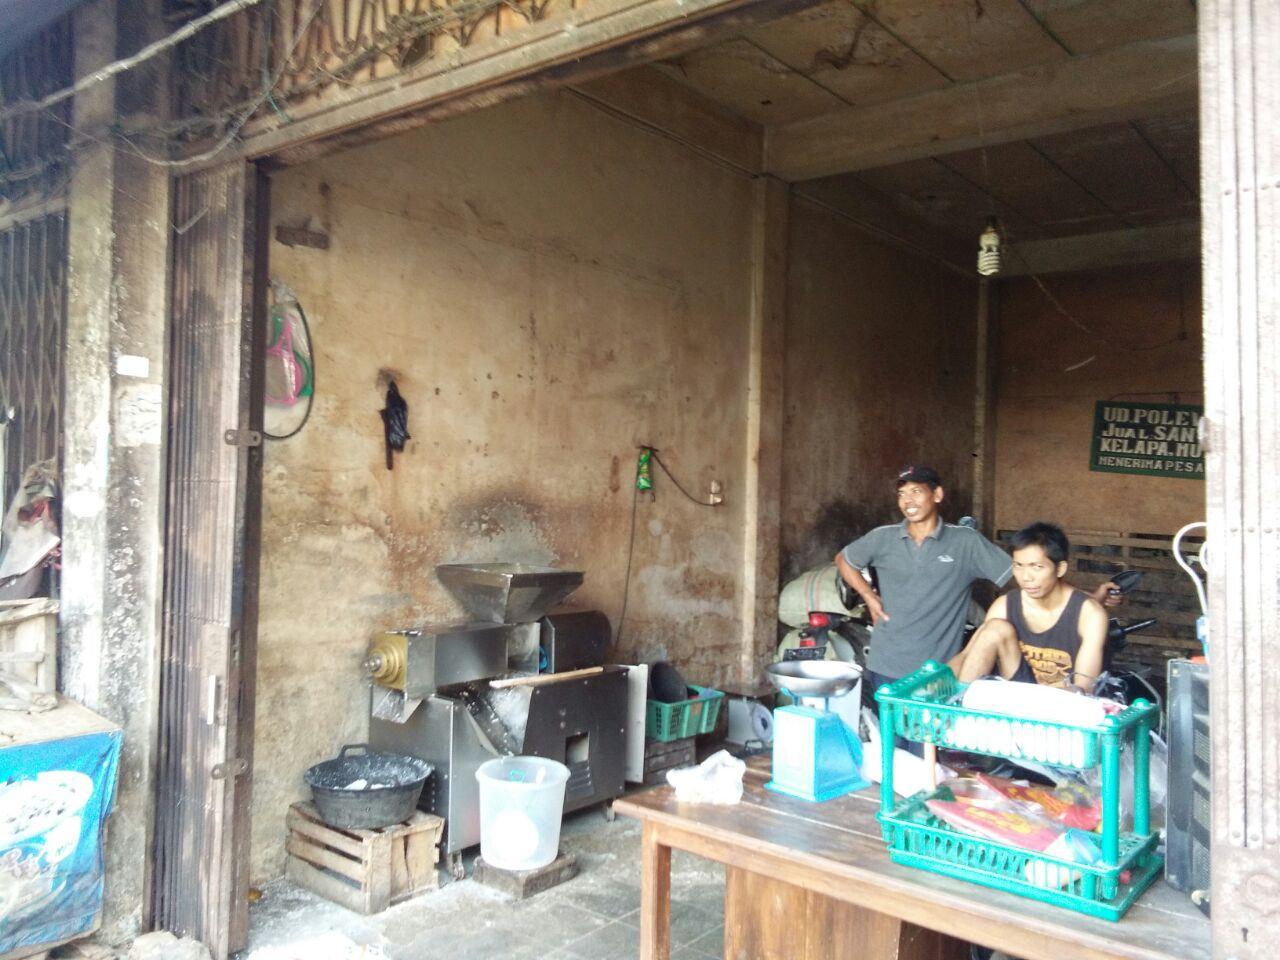 Pedagang di Penampungan Pasar SMEP Diminta Kumpulkan Kuitansi Pembayaran